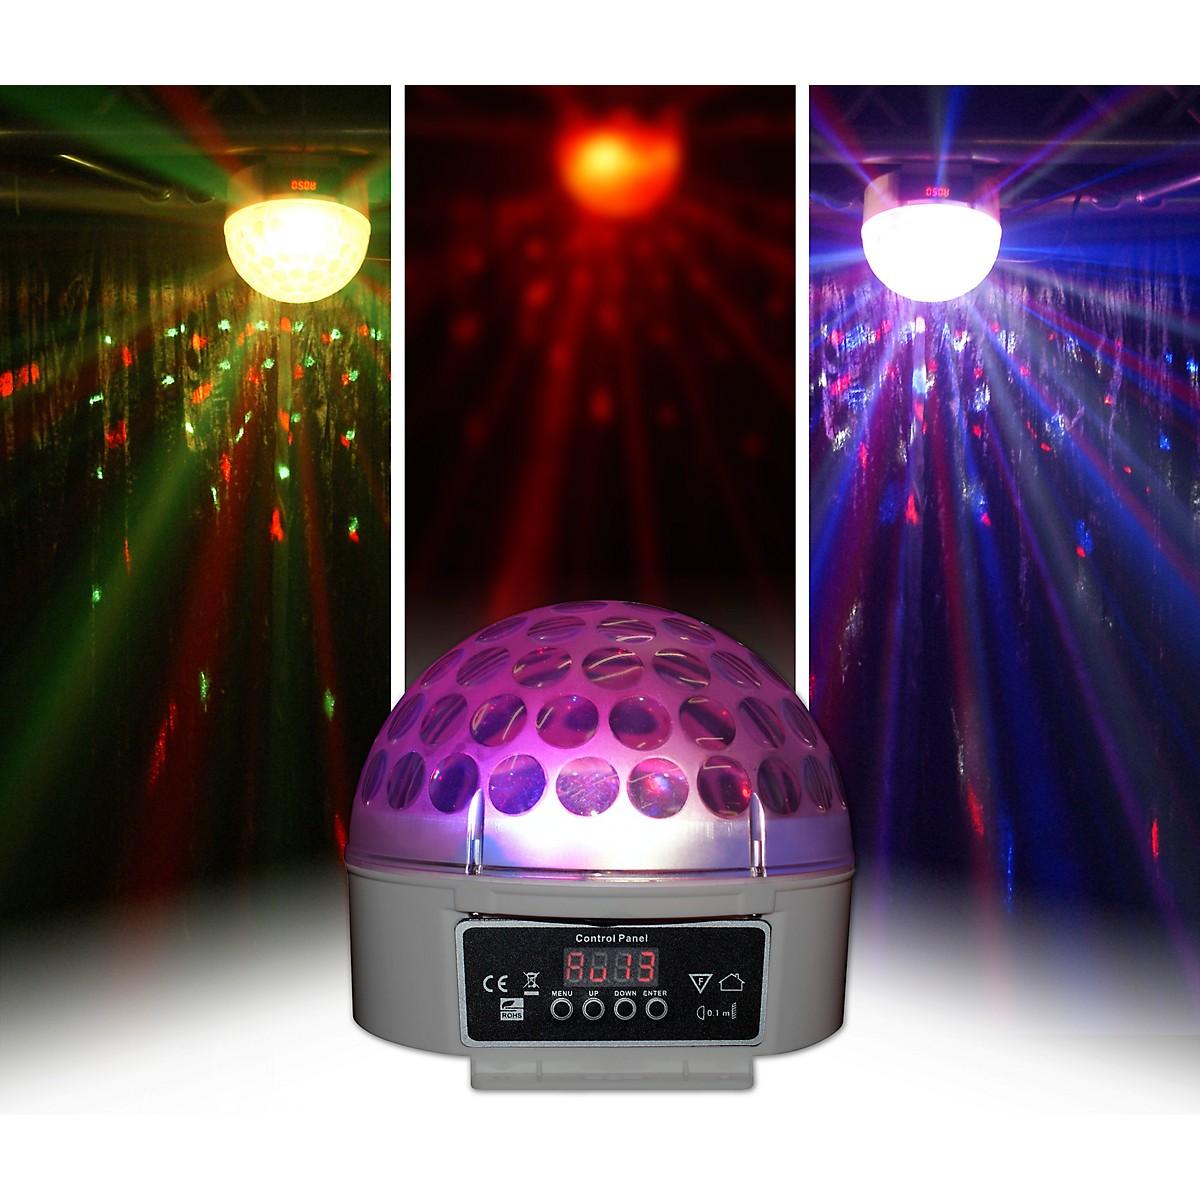 Blizzard Snowball DMX RGBW LED Multi Beam Effect Light